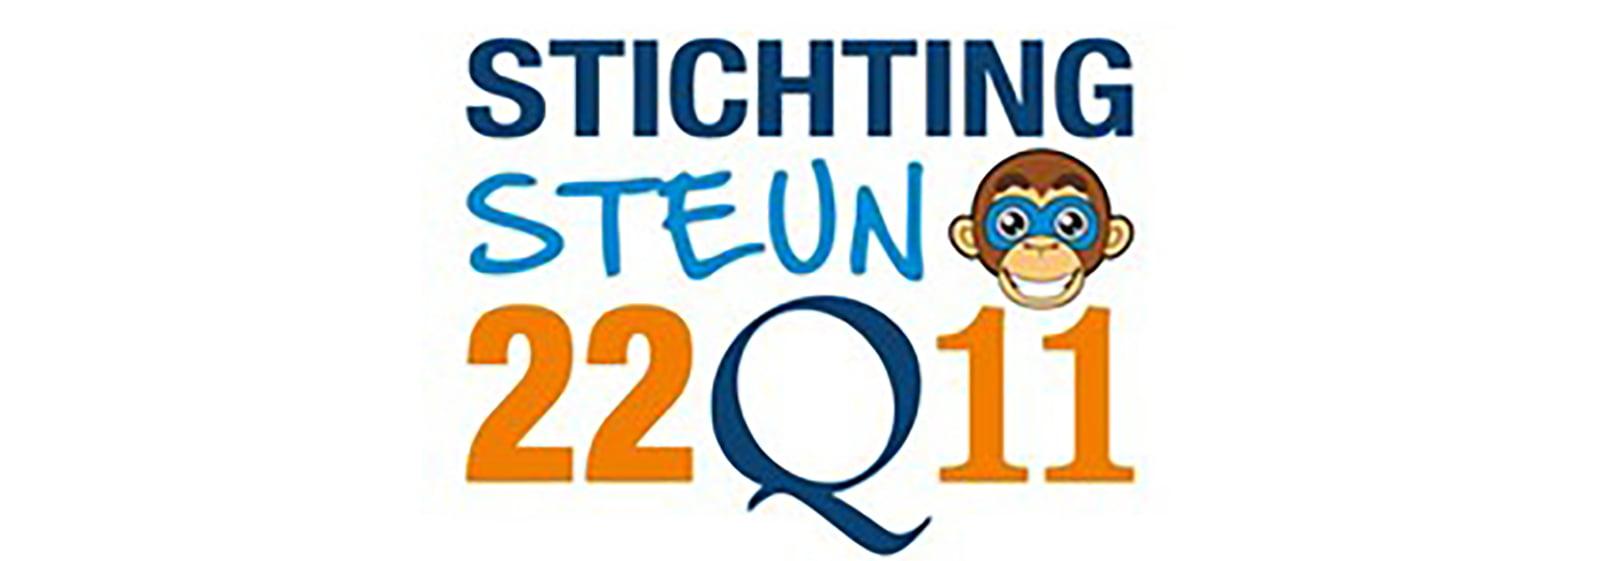 Stichting_Steun_22Q11